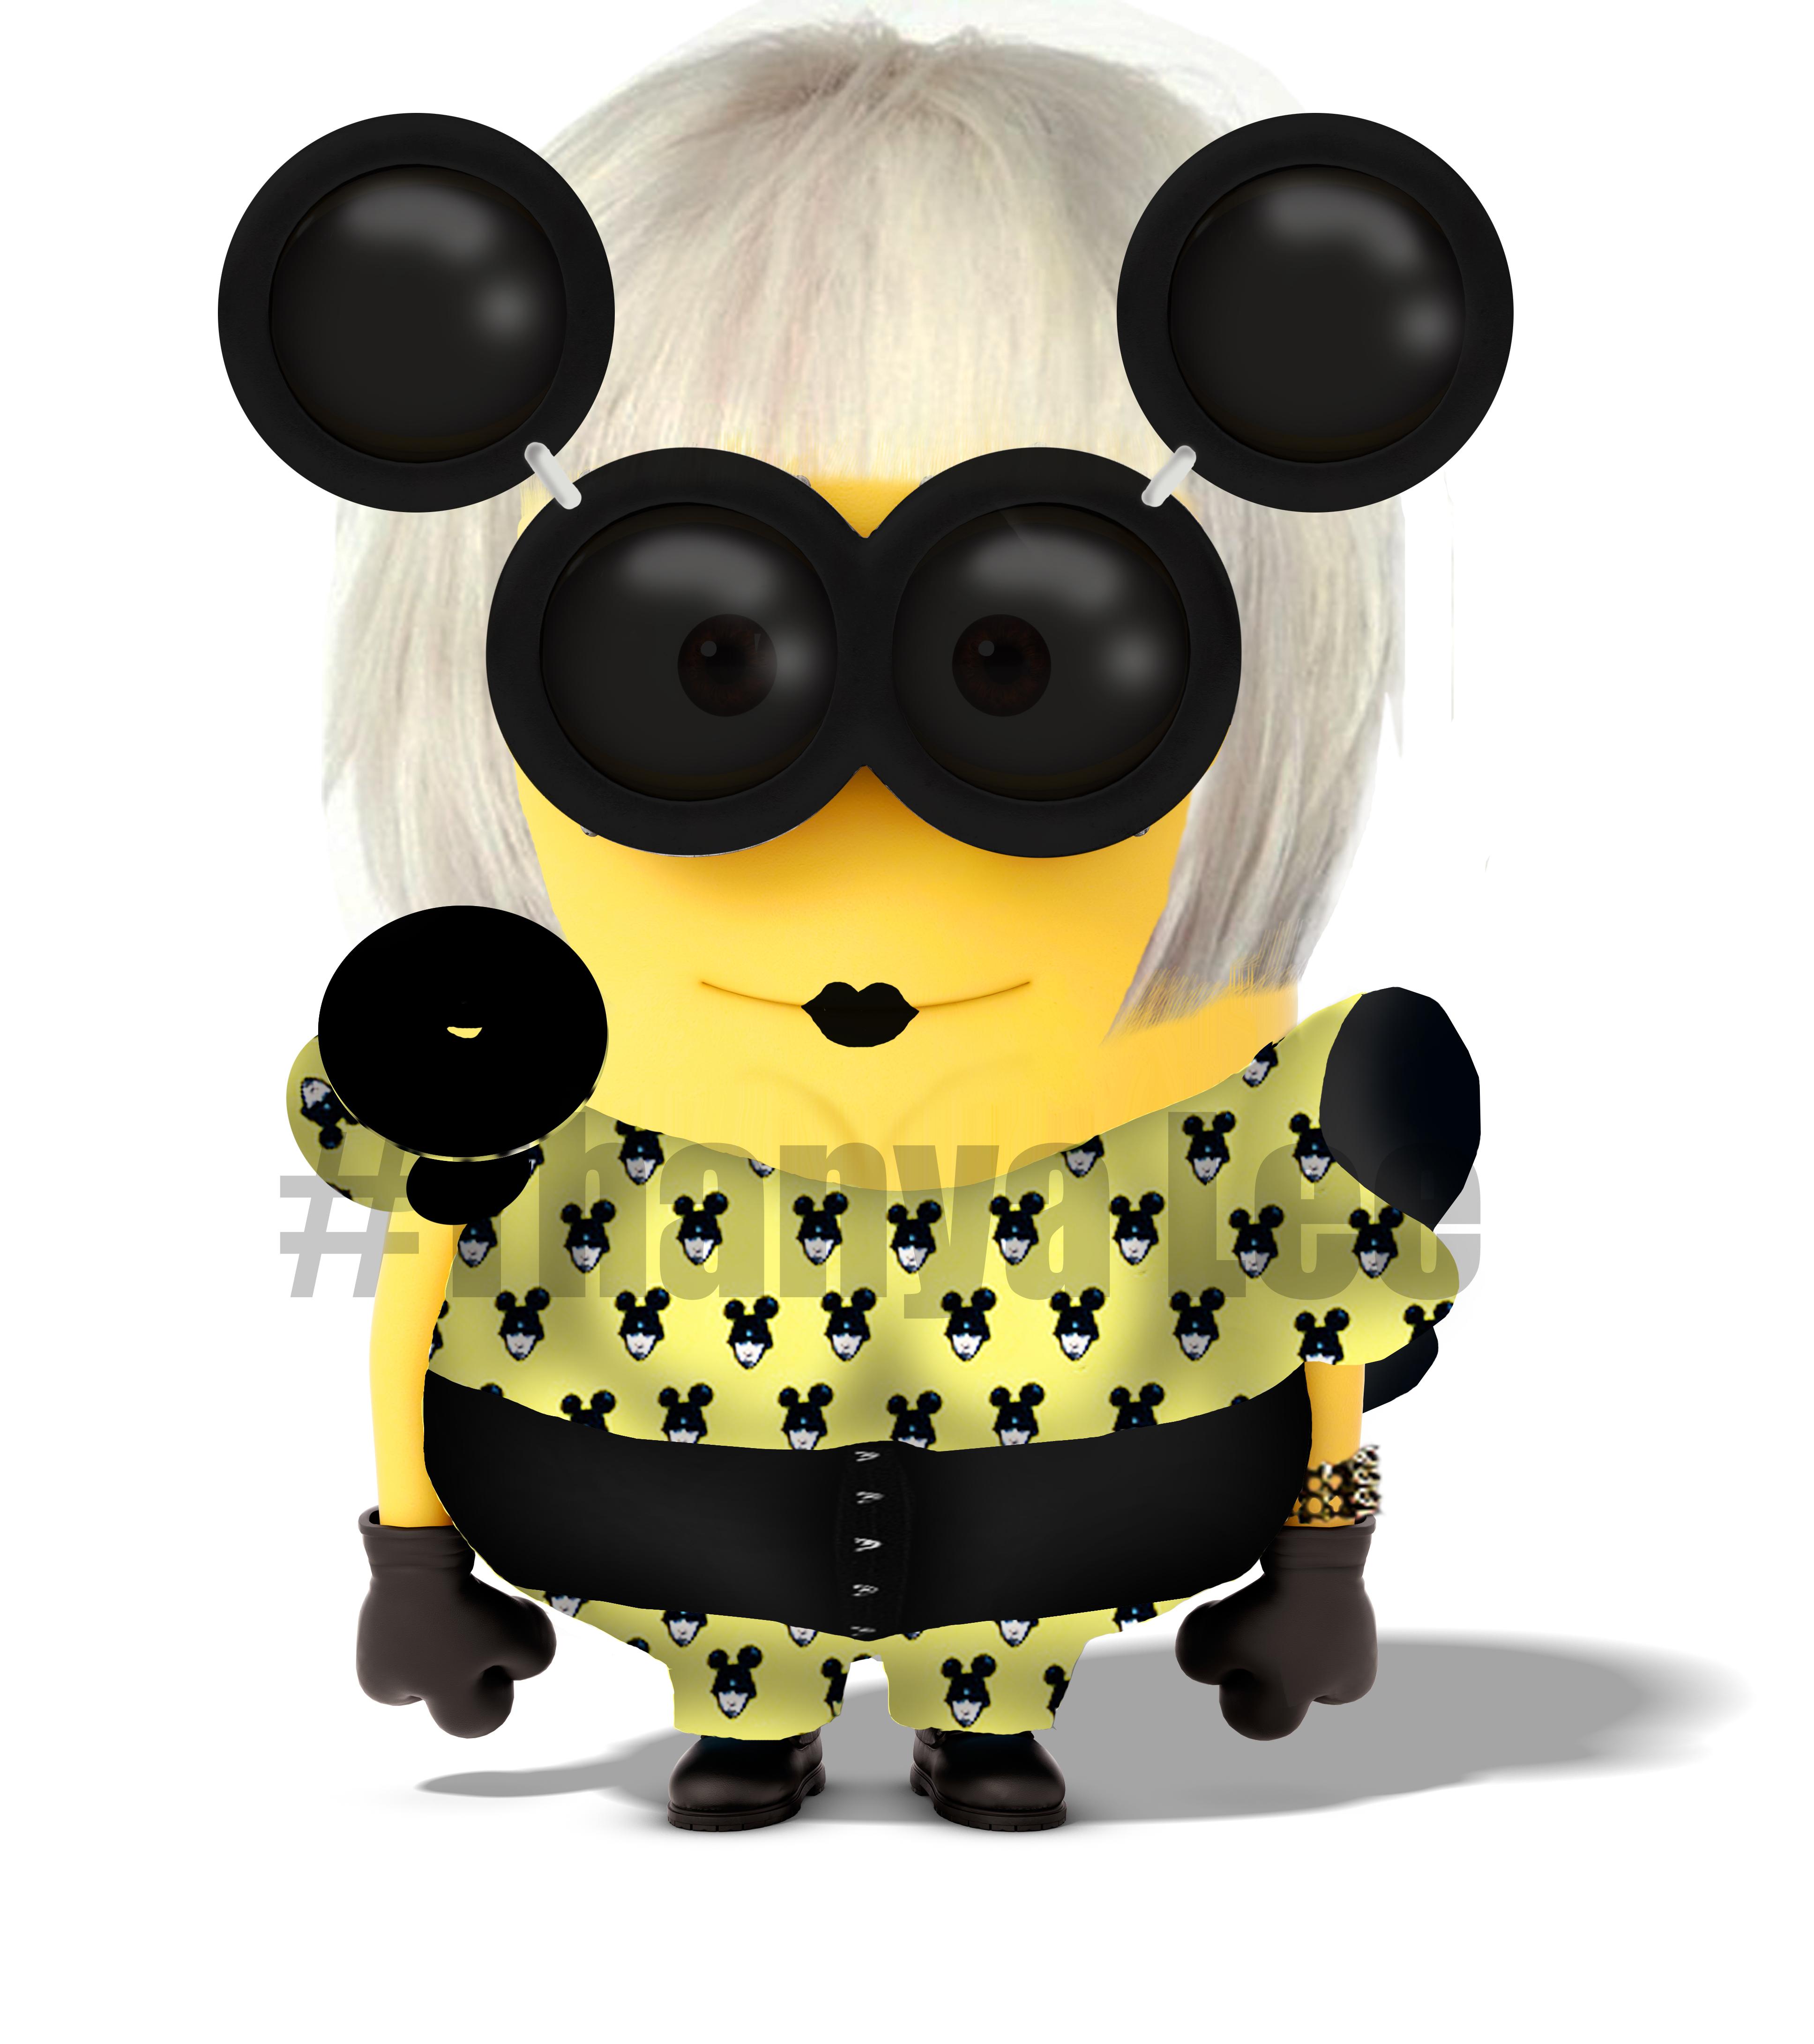 Minion Gaga (Dave) Pt.2